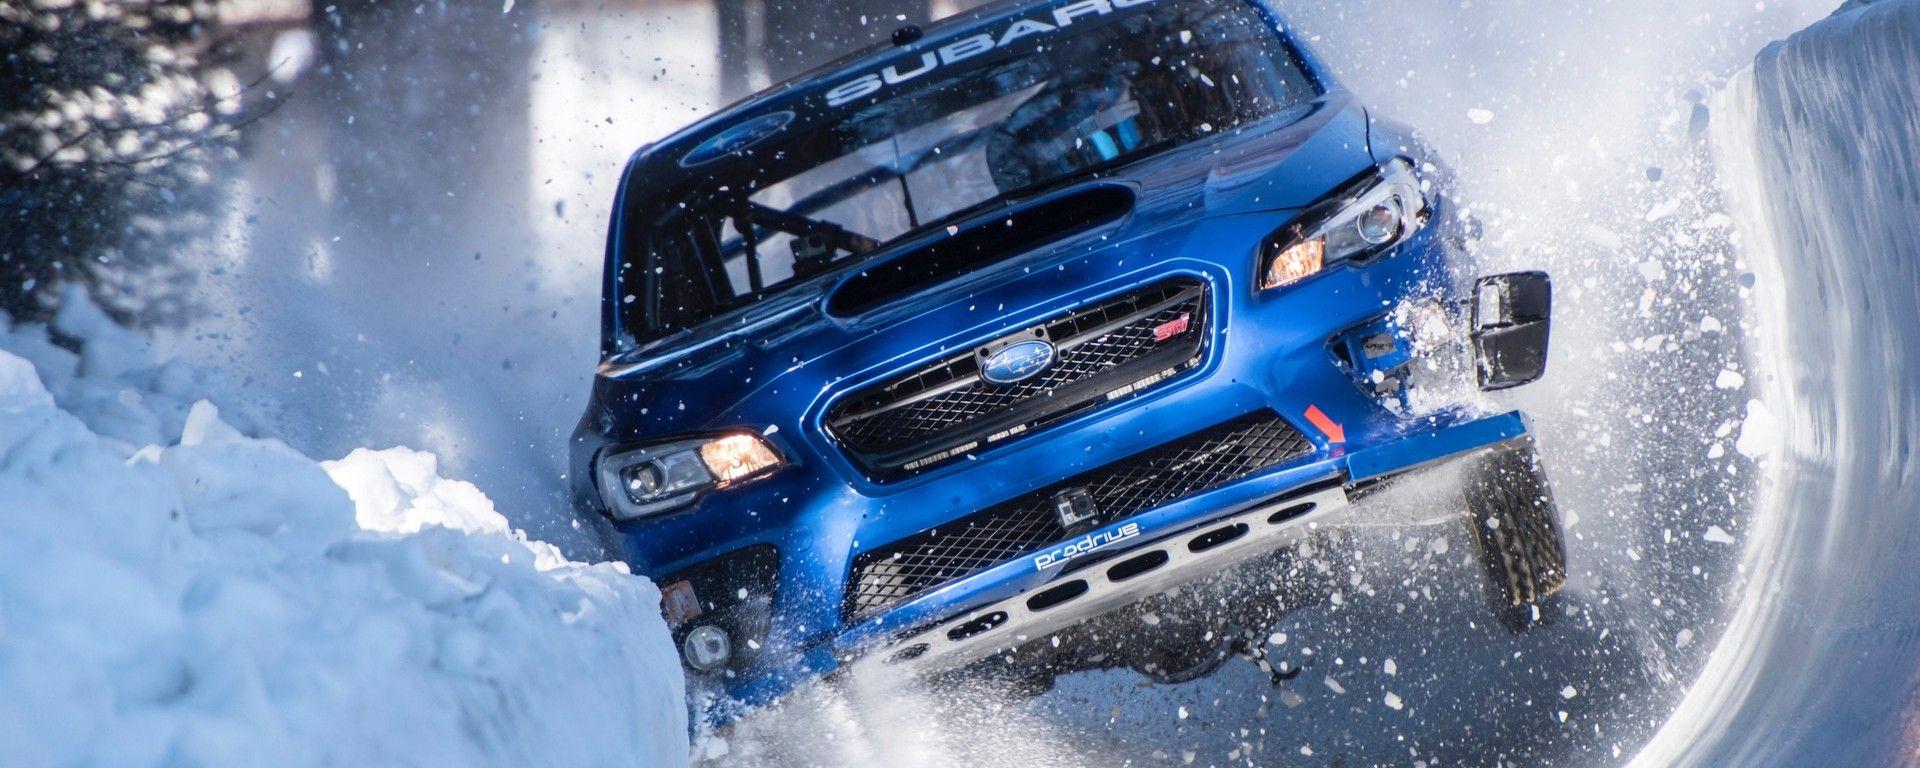 Subaru: storia di una Impreza lanciata su una pista di bob